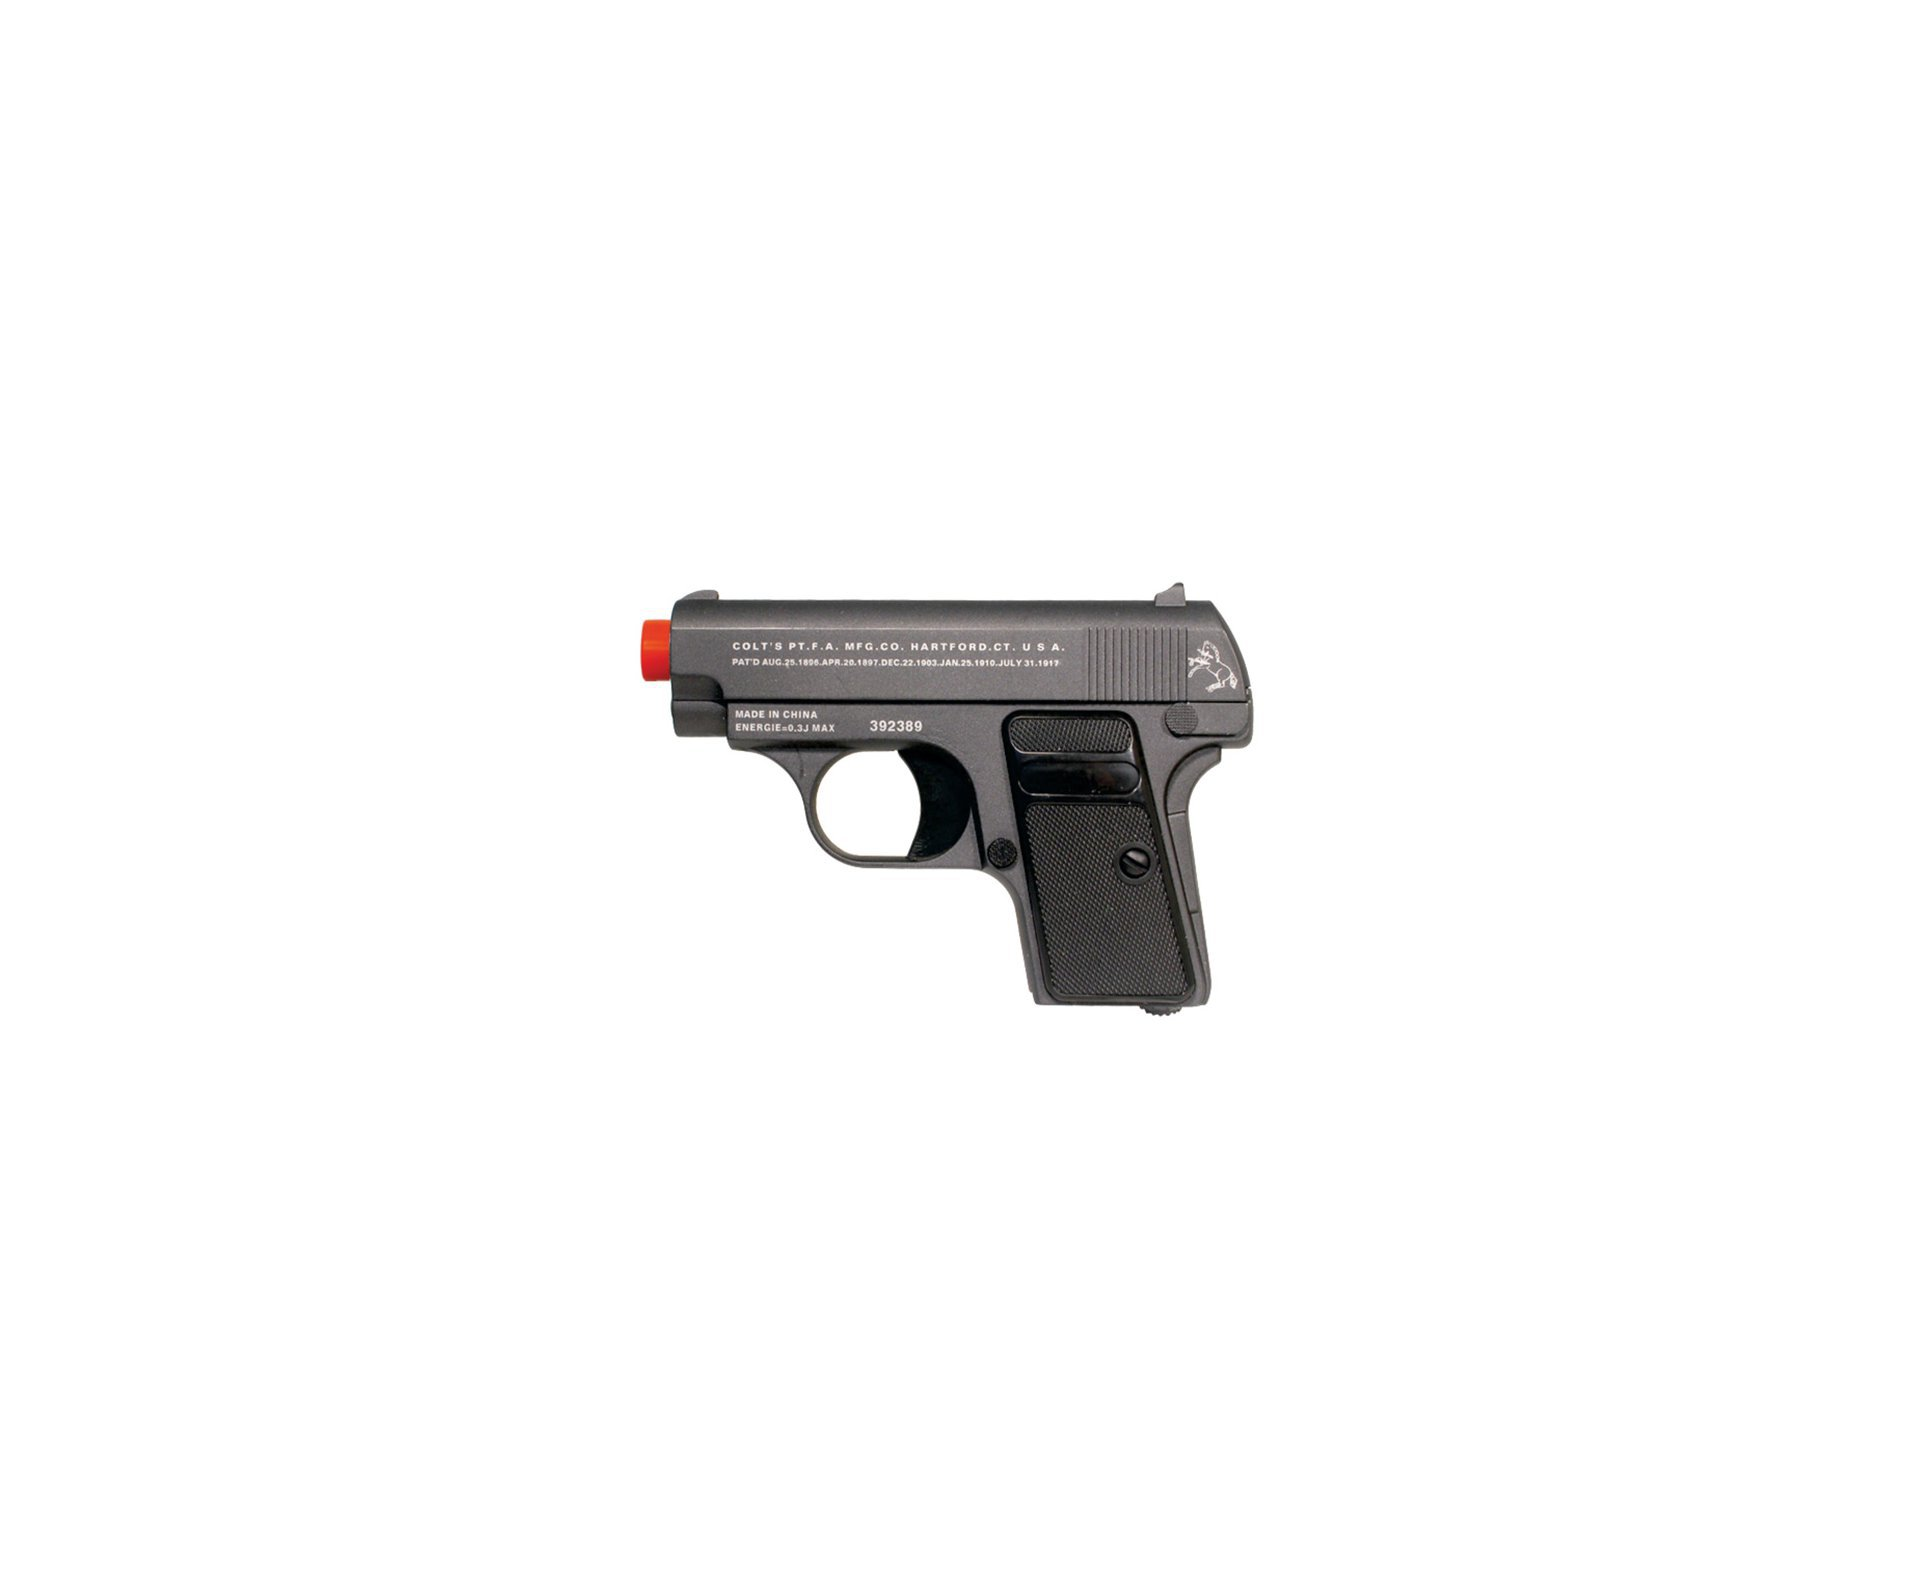 Pistola De Airsoft Colt 25 Full Metal Cal 6,0 Mm + Esferas Actionx 0,12g - Cyber Gun